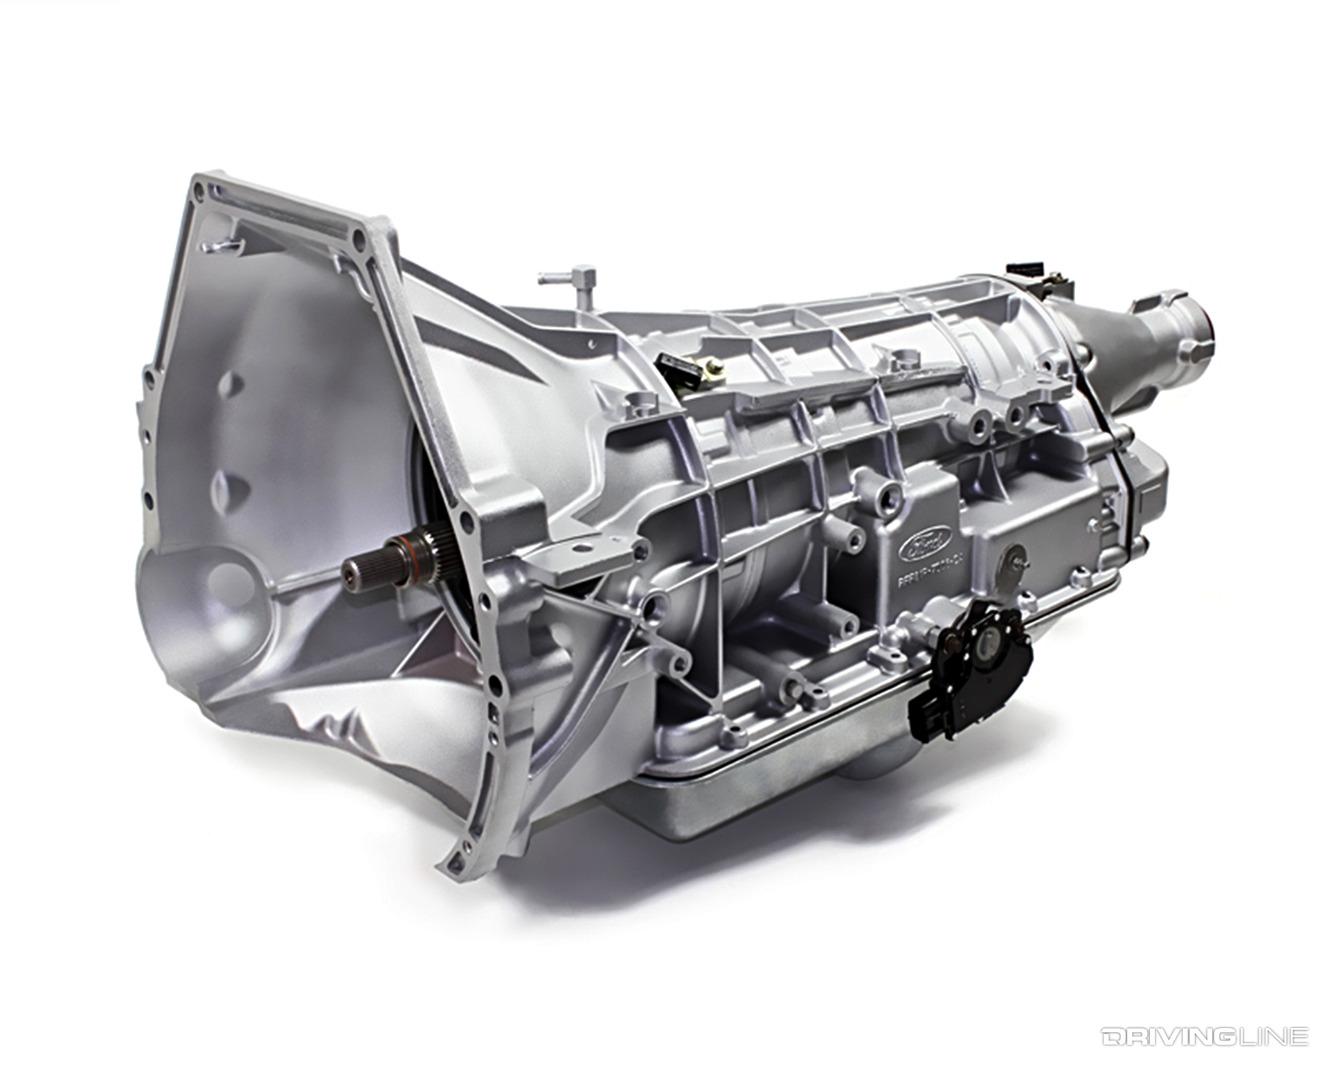 2004 f350 6.0 transmission